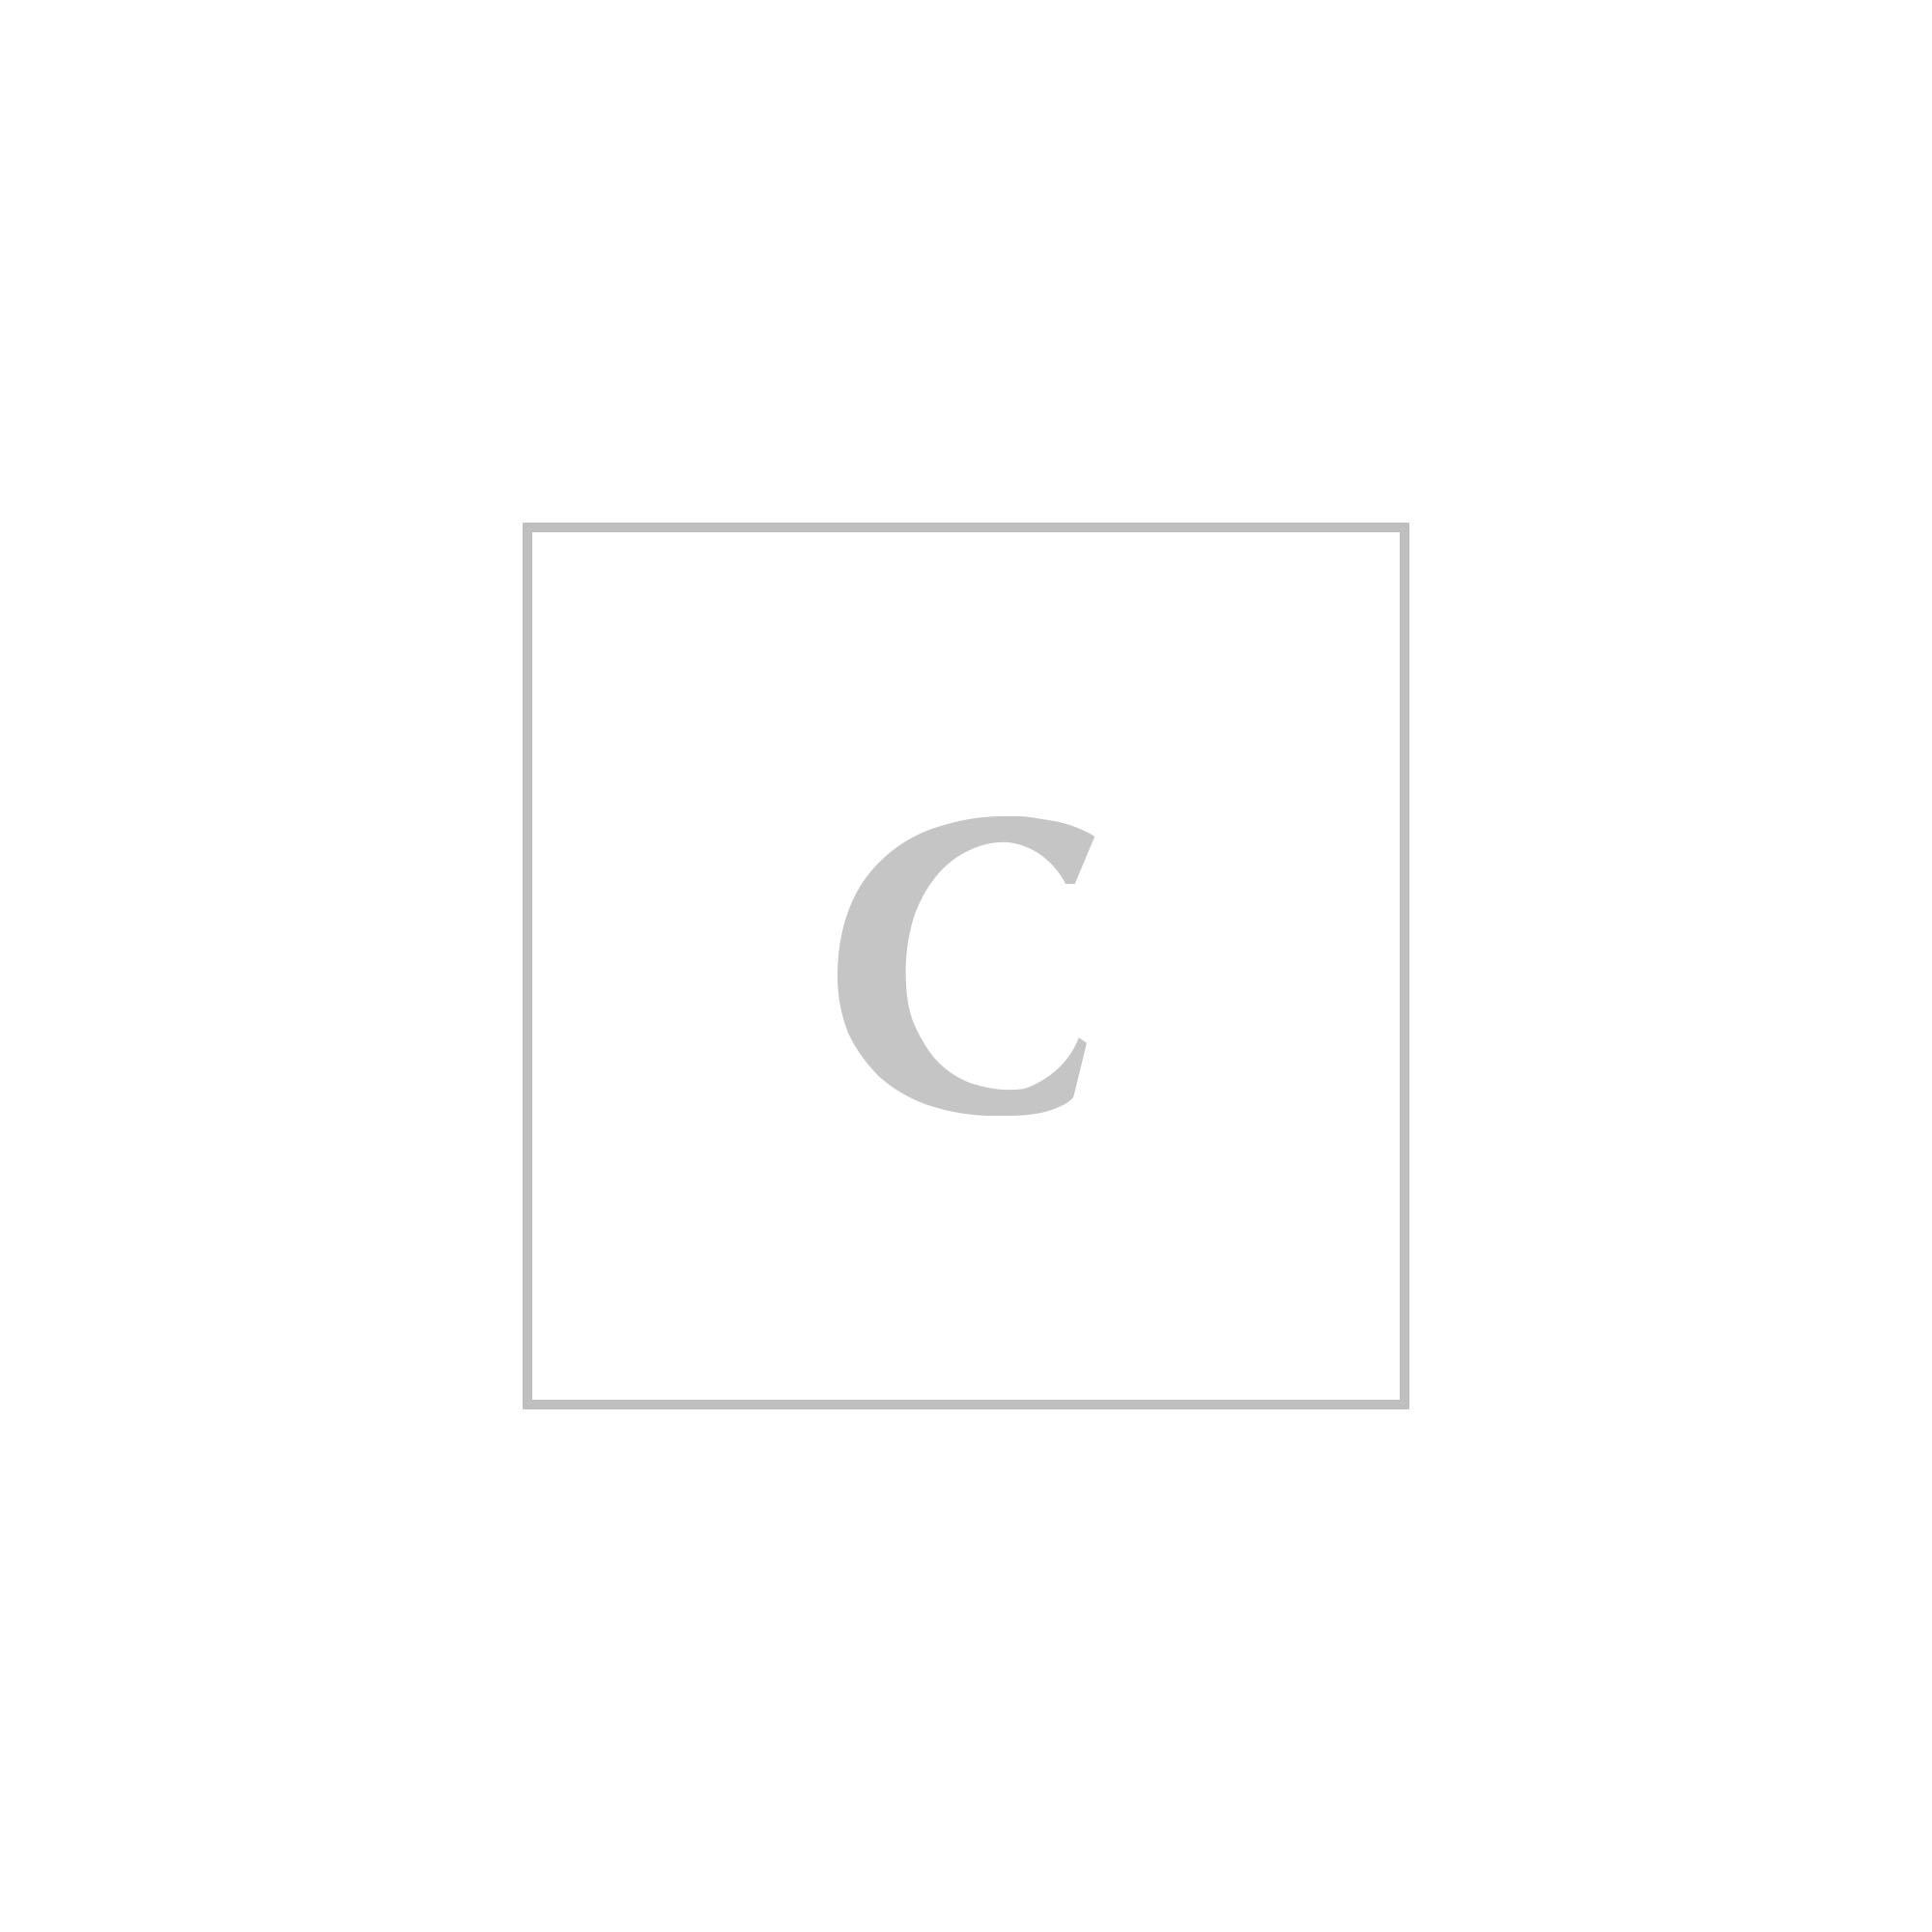 Moncler capsule giubbotto avery